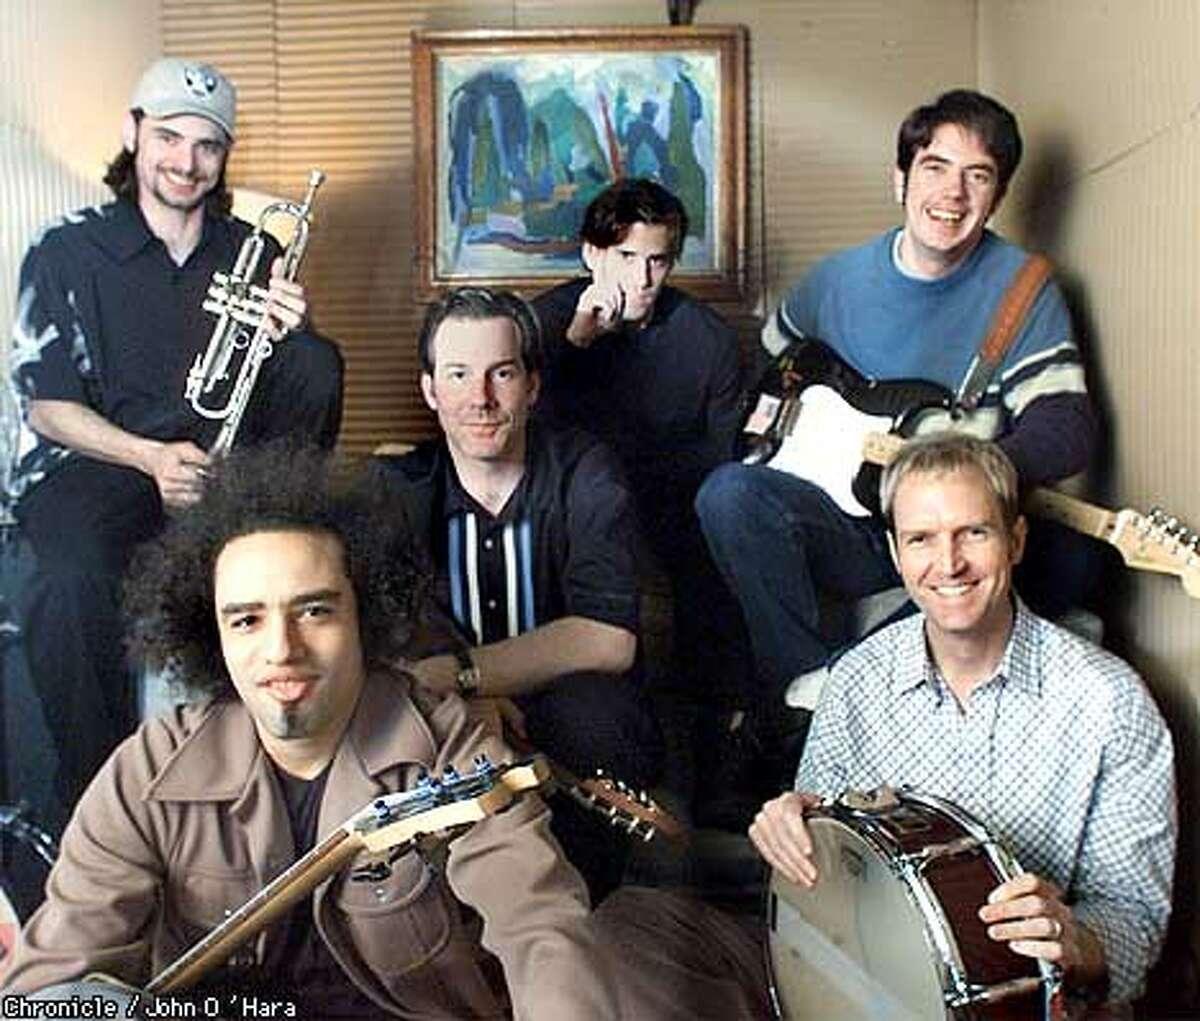 Kyle Wheeler 28, Larry RIggs 27, Matt Blackett 36, Tom Luce 30, Brian Kroll 28, Jonathan Moe 36 photo/John O'Hara